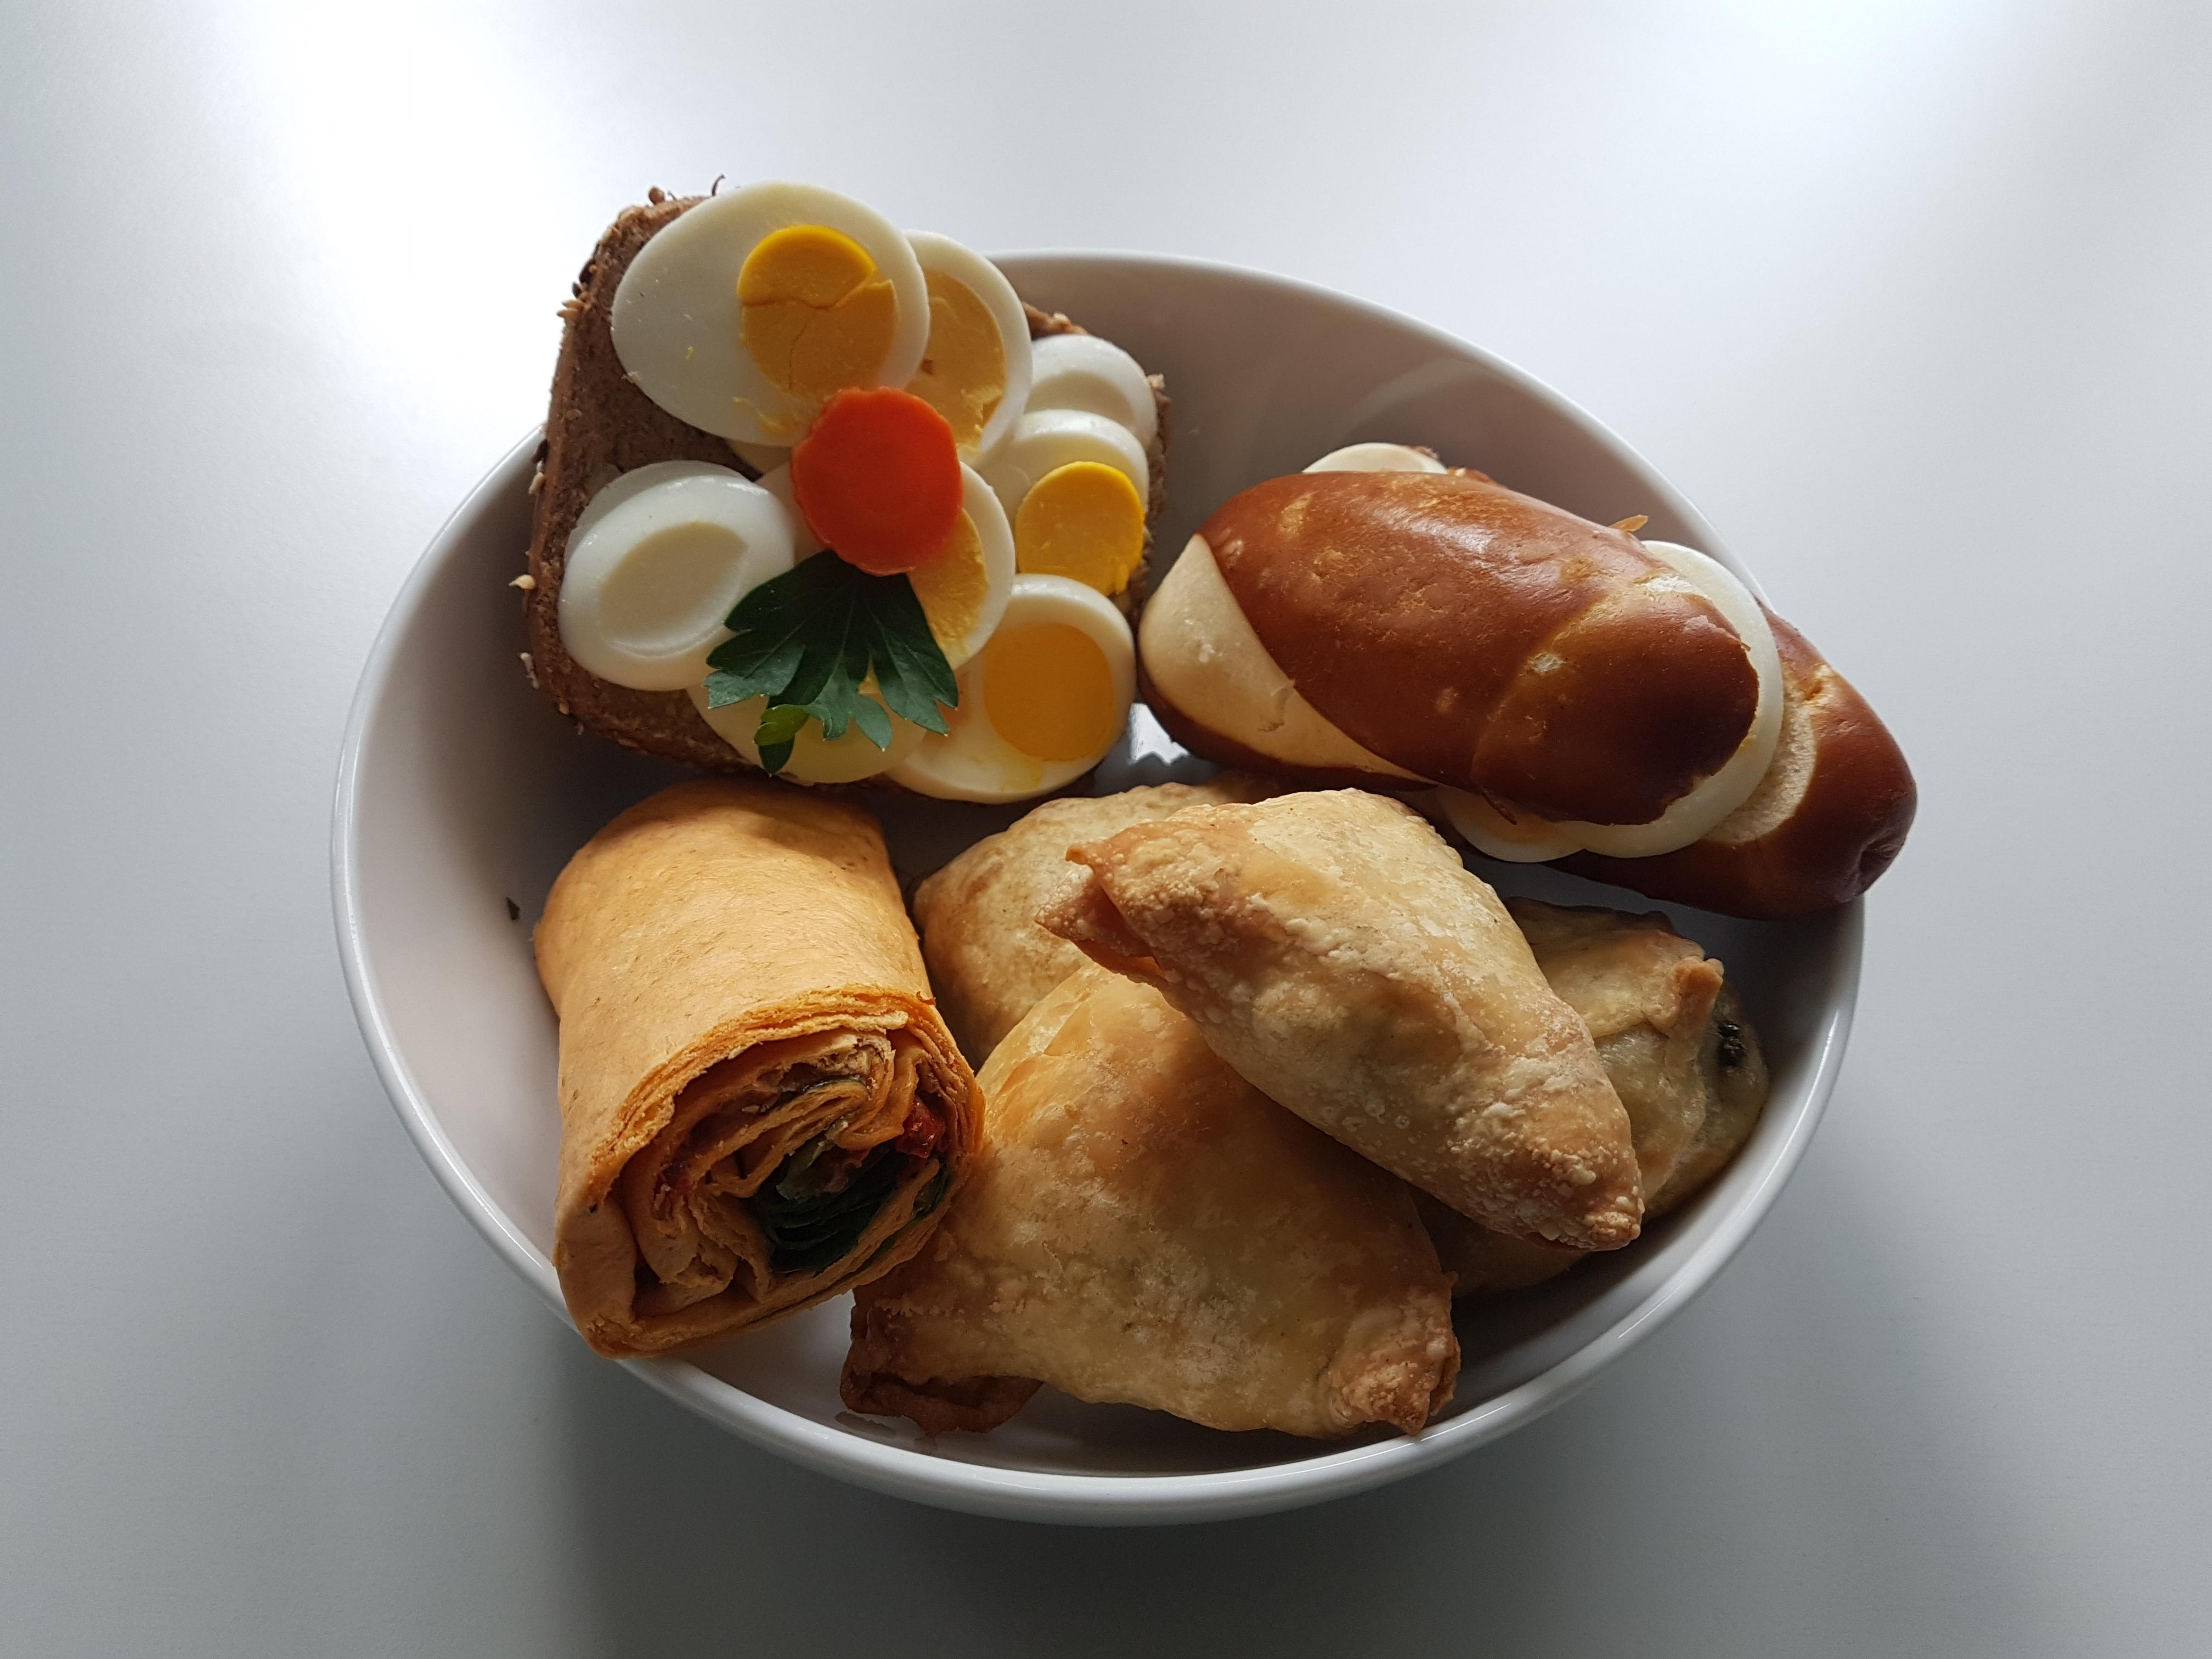 https://foodloader.net/Holz_2019-05-28_Snacks.jpg